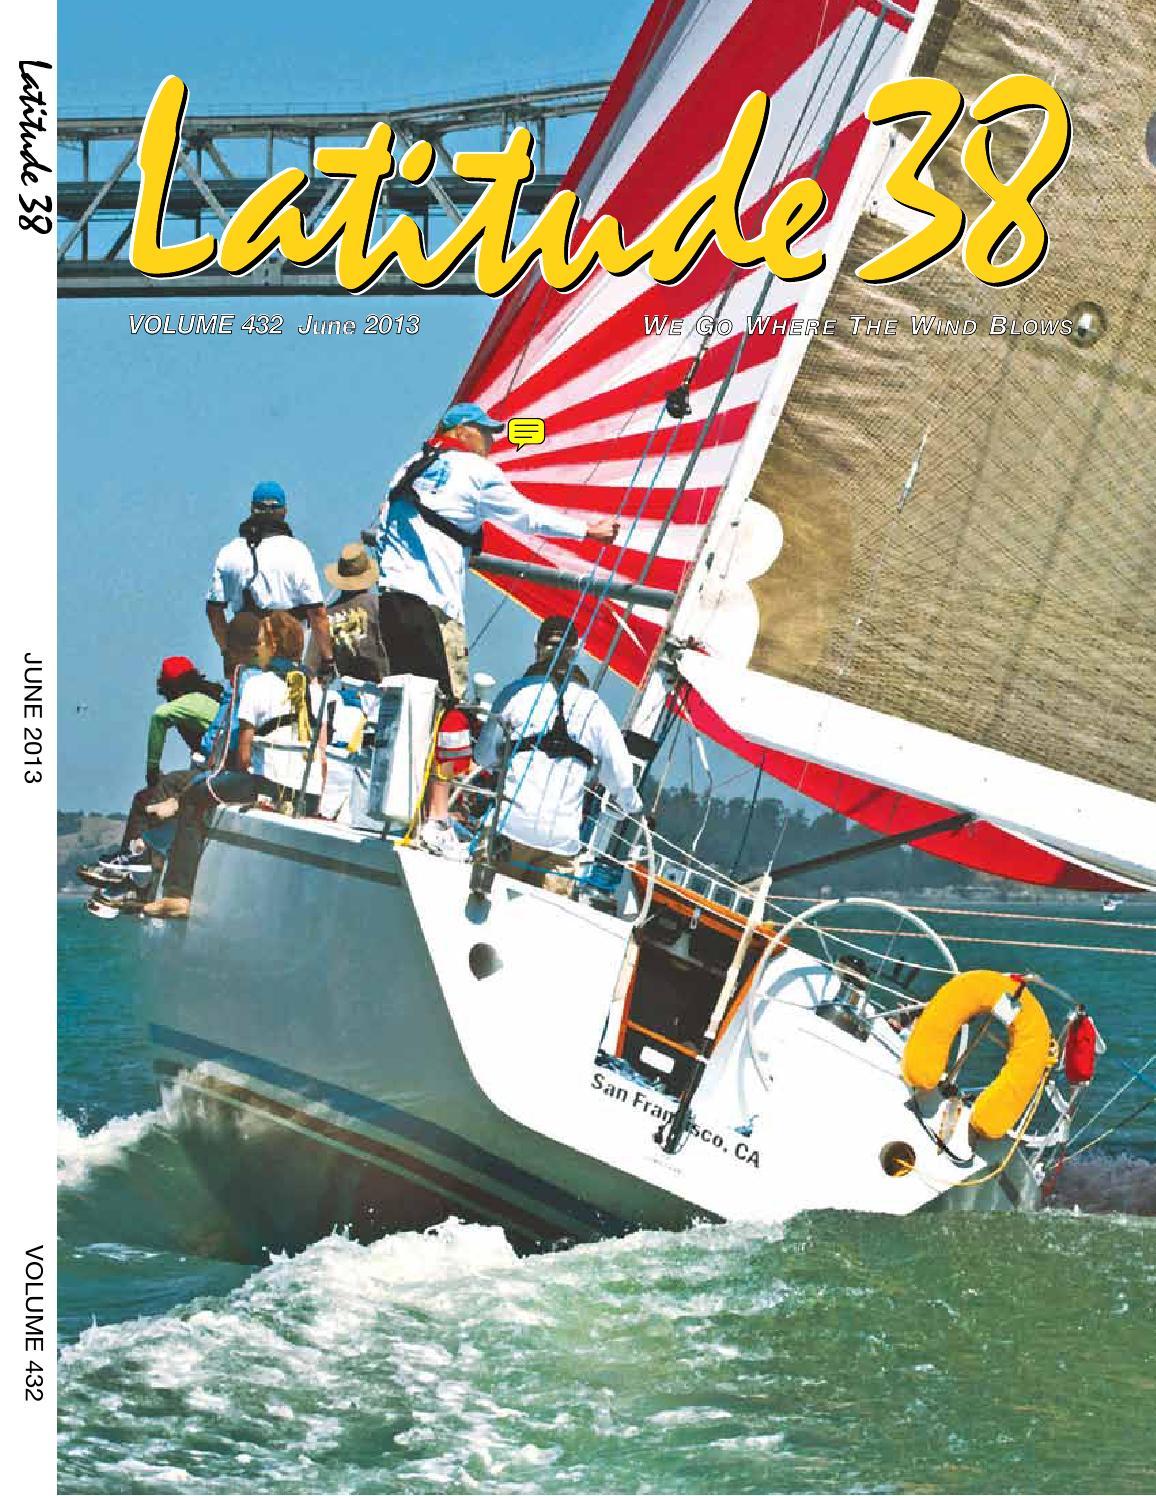 Sea Brake for Marine Boat//Yacht//Jet Ski//Inflatable//Power Boat//Sail Boat Dyna-Living Drift Sock Sea Anchor Drogue